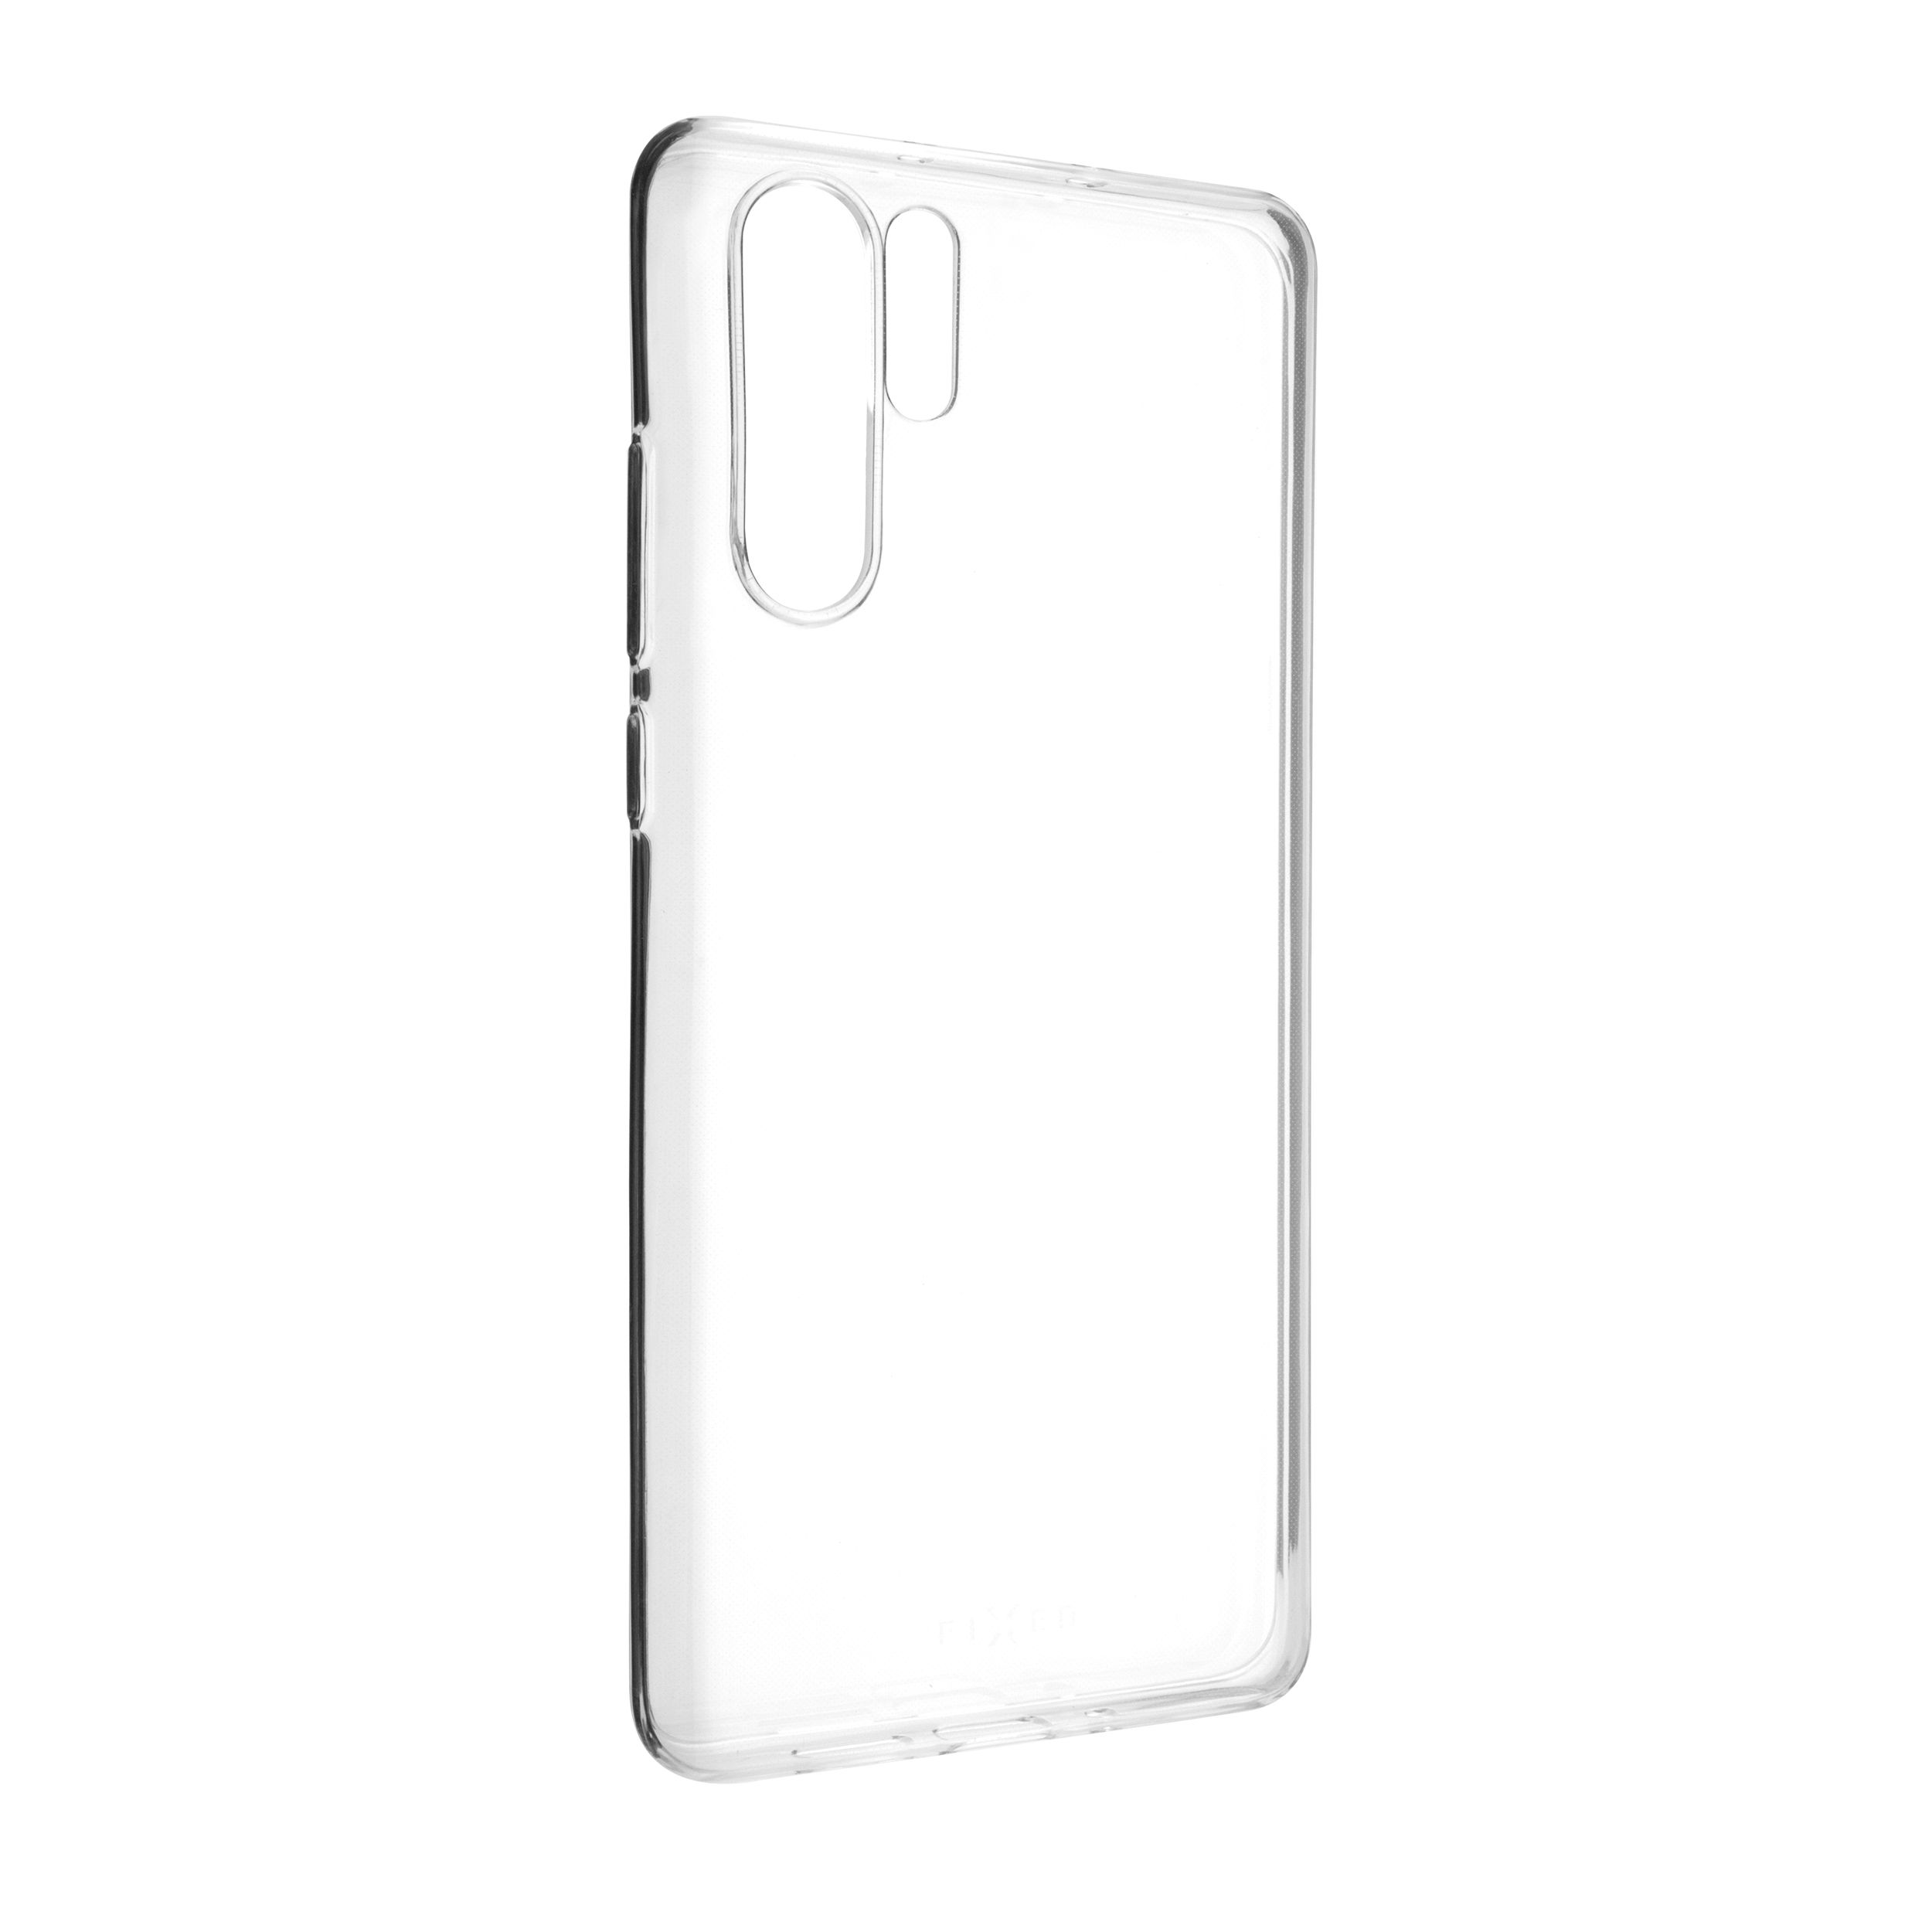 Ultratenké TPU gelové pouzdro FIXED Skin pro Huawei P30 Pro, 0,6 mm, čiré